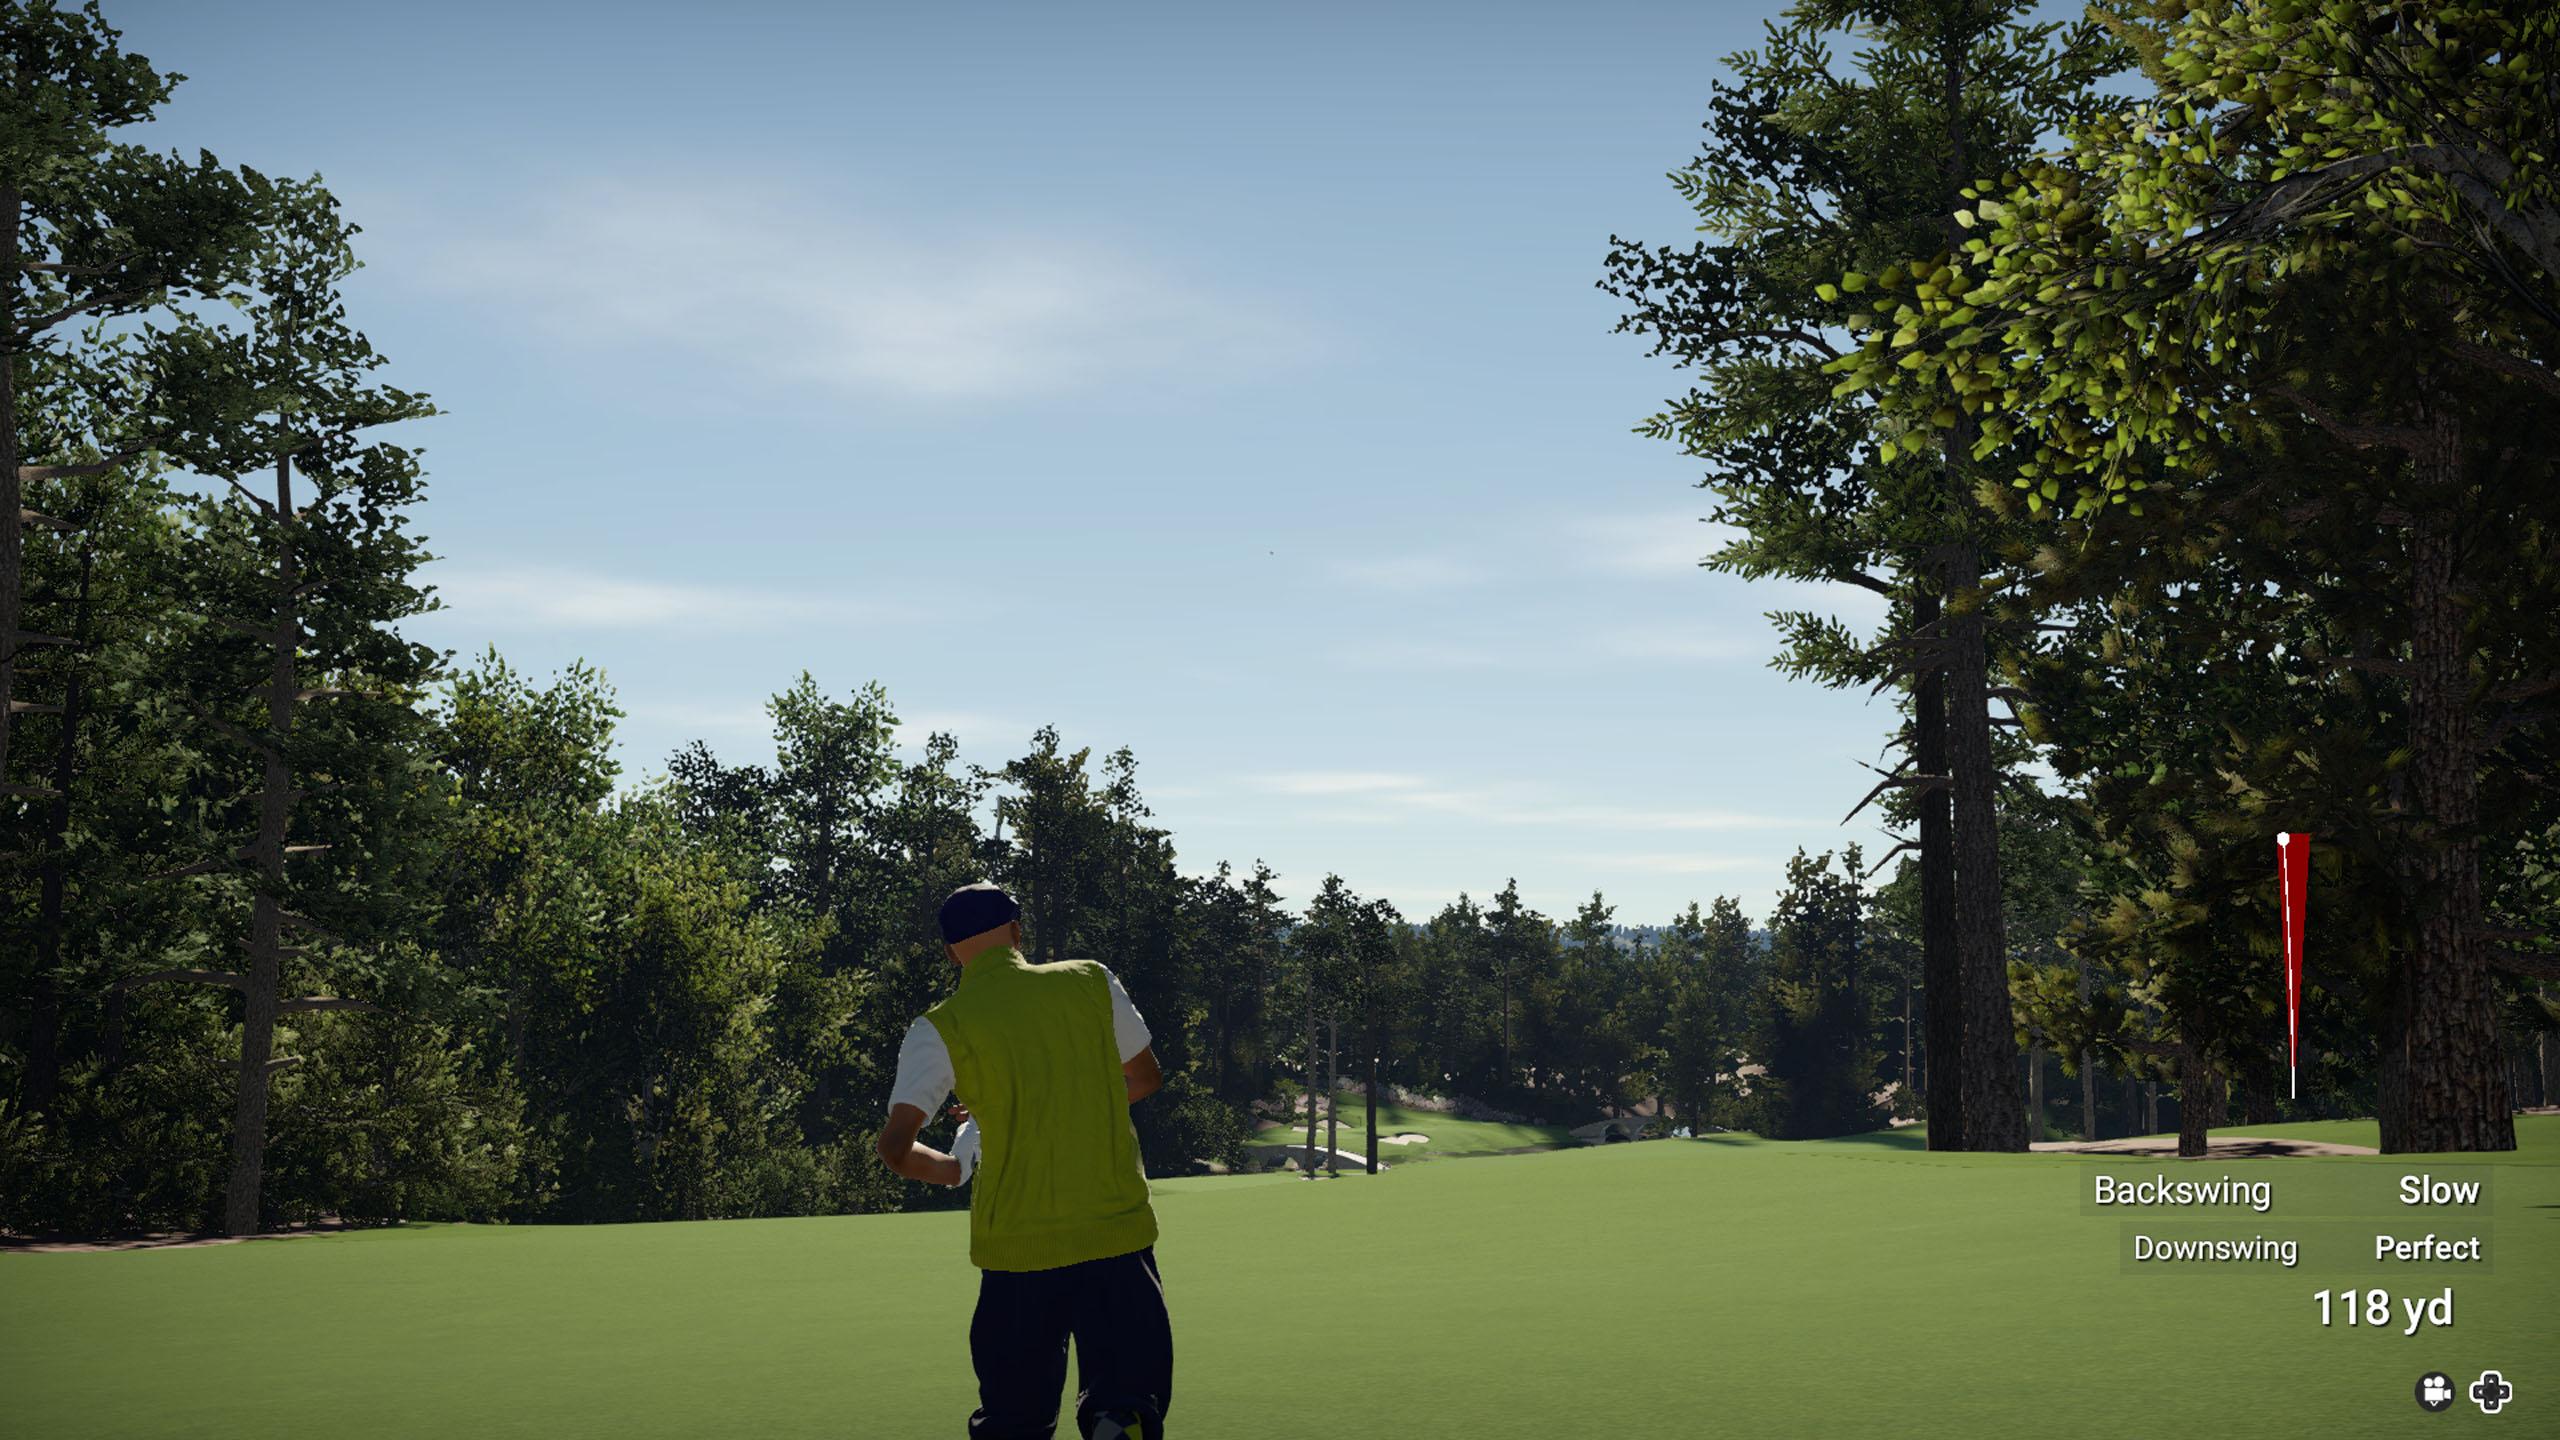 The Golf Club Screenshot 2018.05.09 - 13.26.24.41